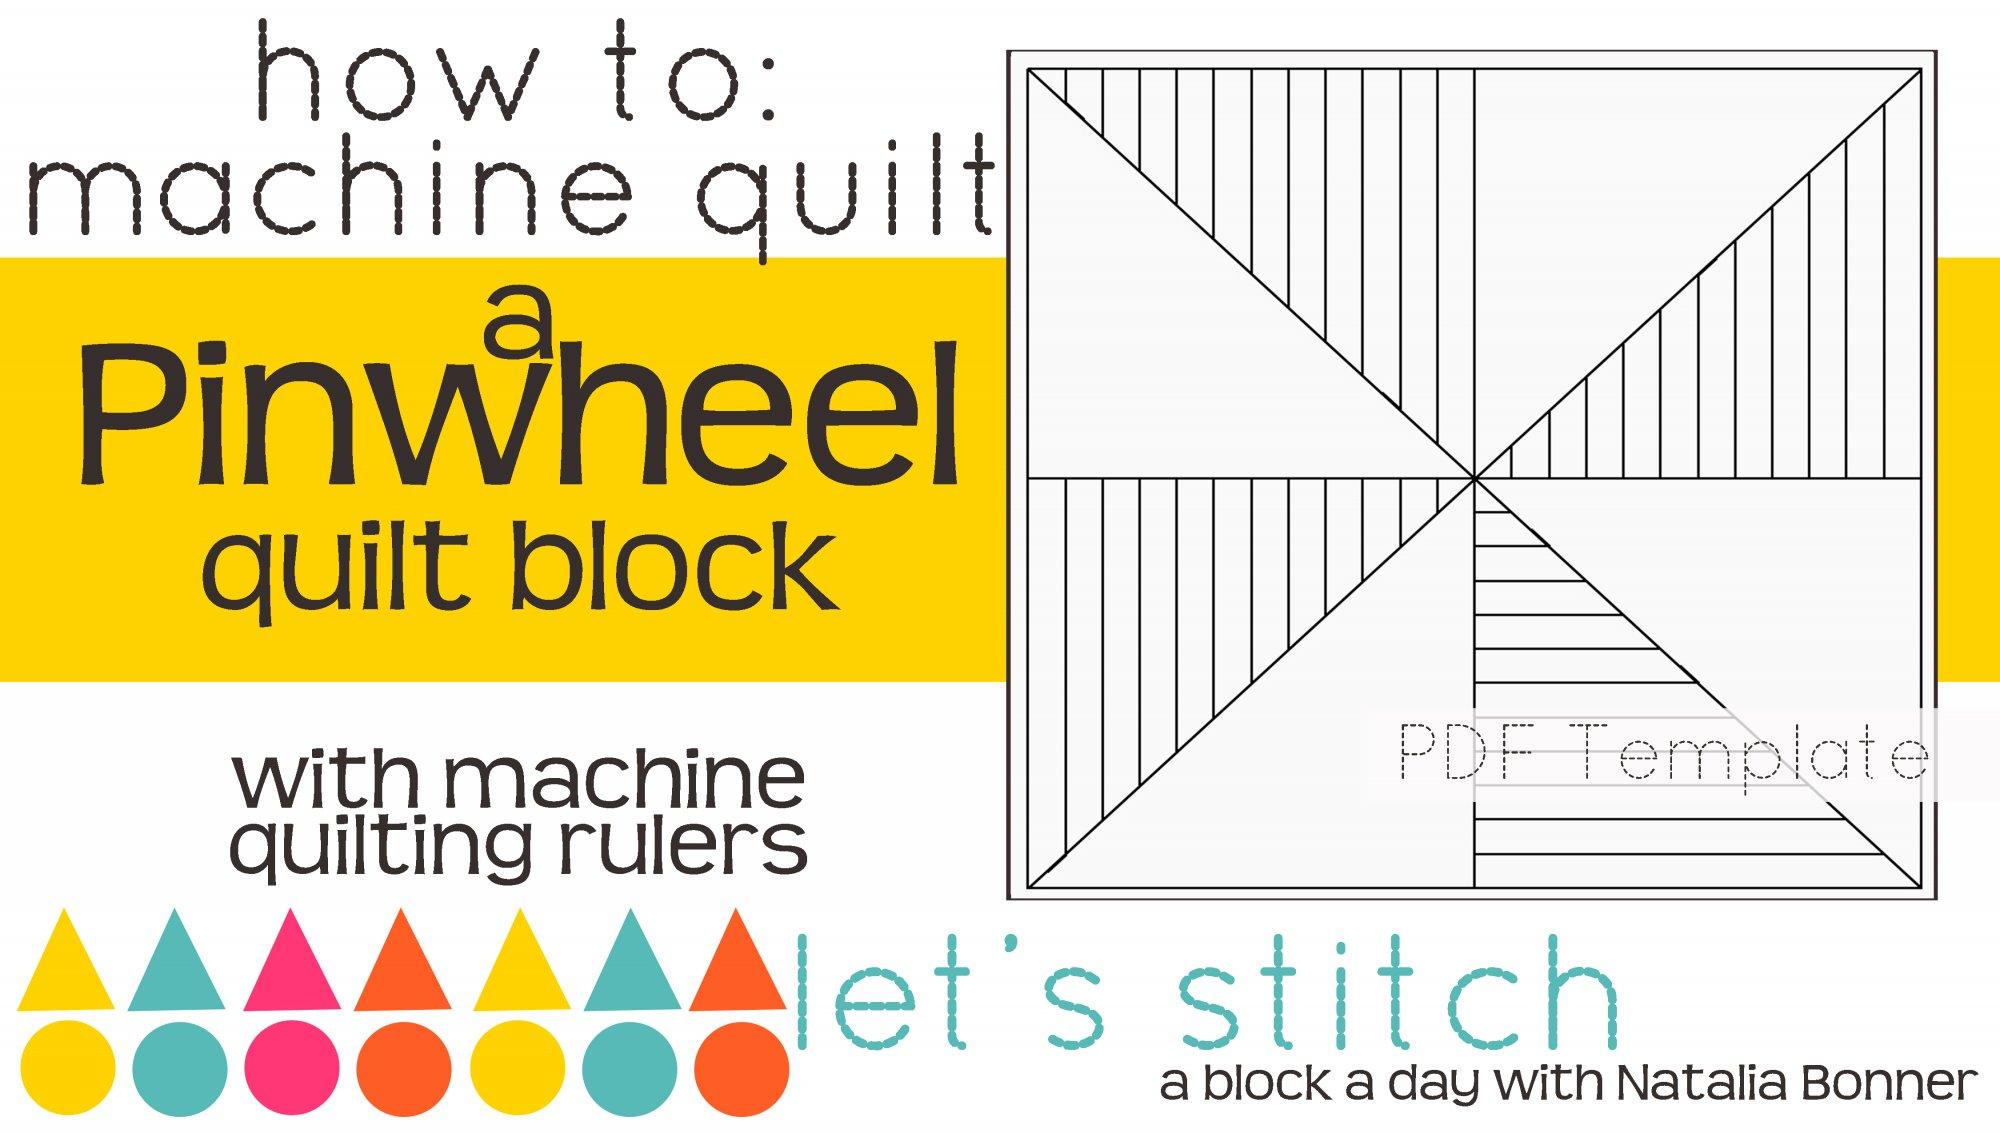 Let's Stitch - A Block a Day With Natalia Bonner - PDF - Pinwheel